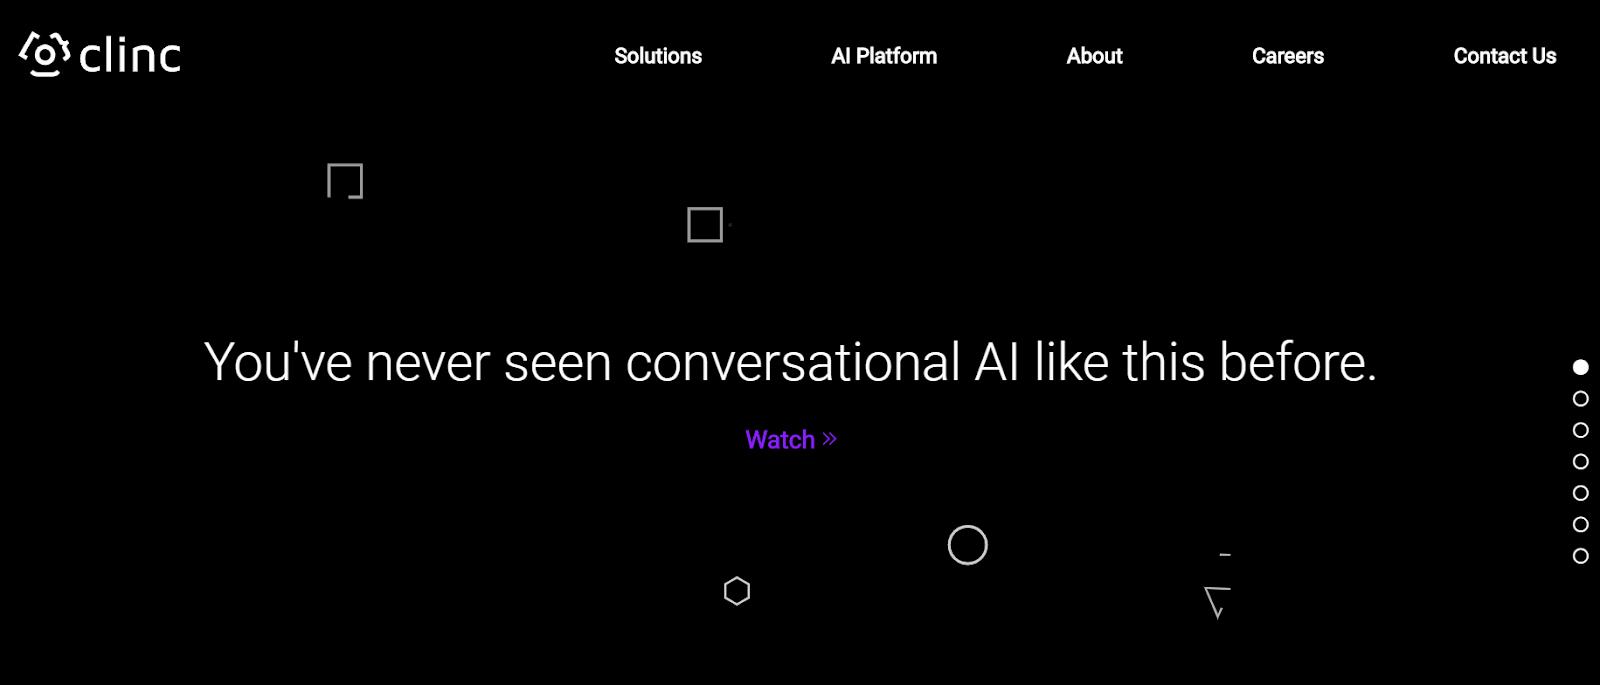 Clinc Conversational AI Platforms